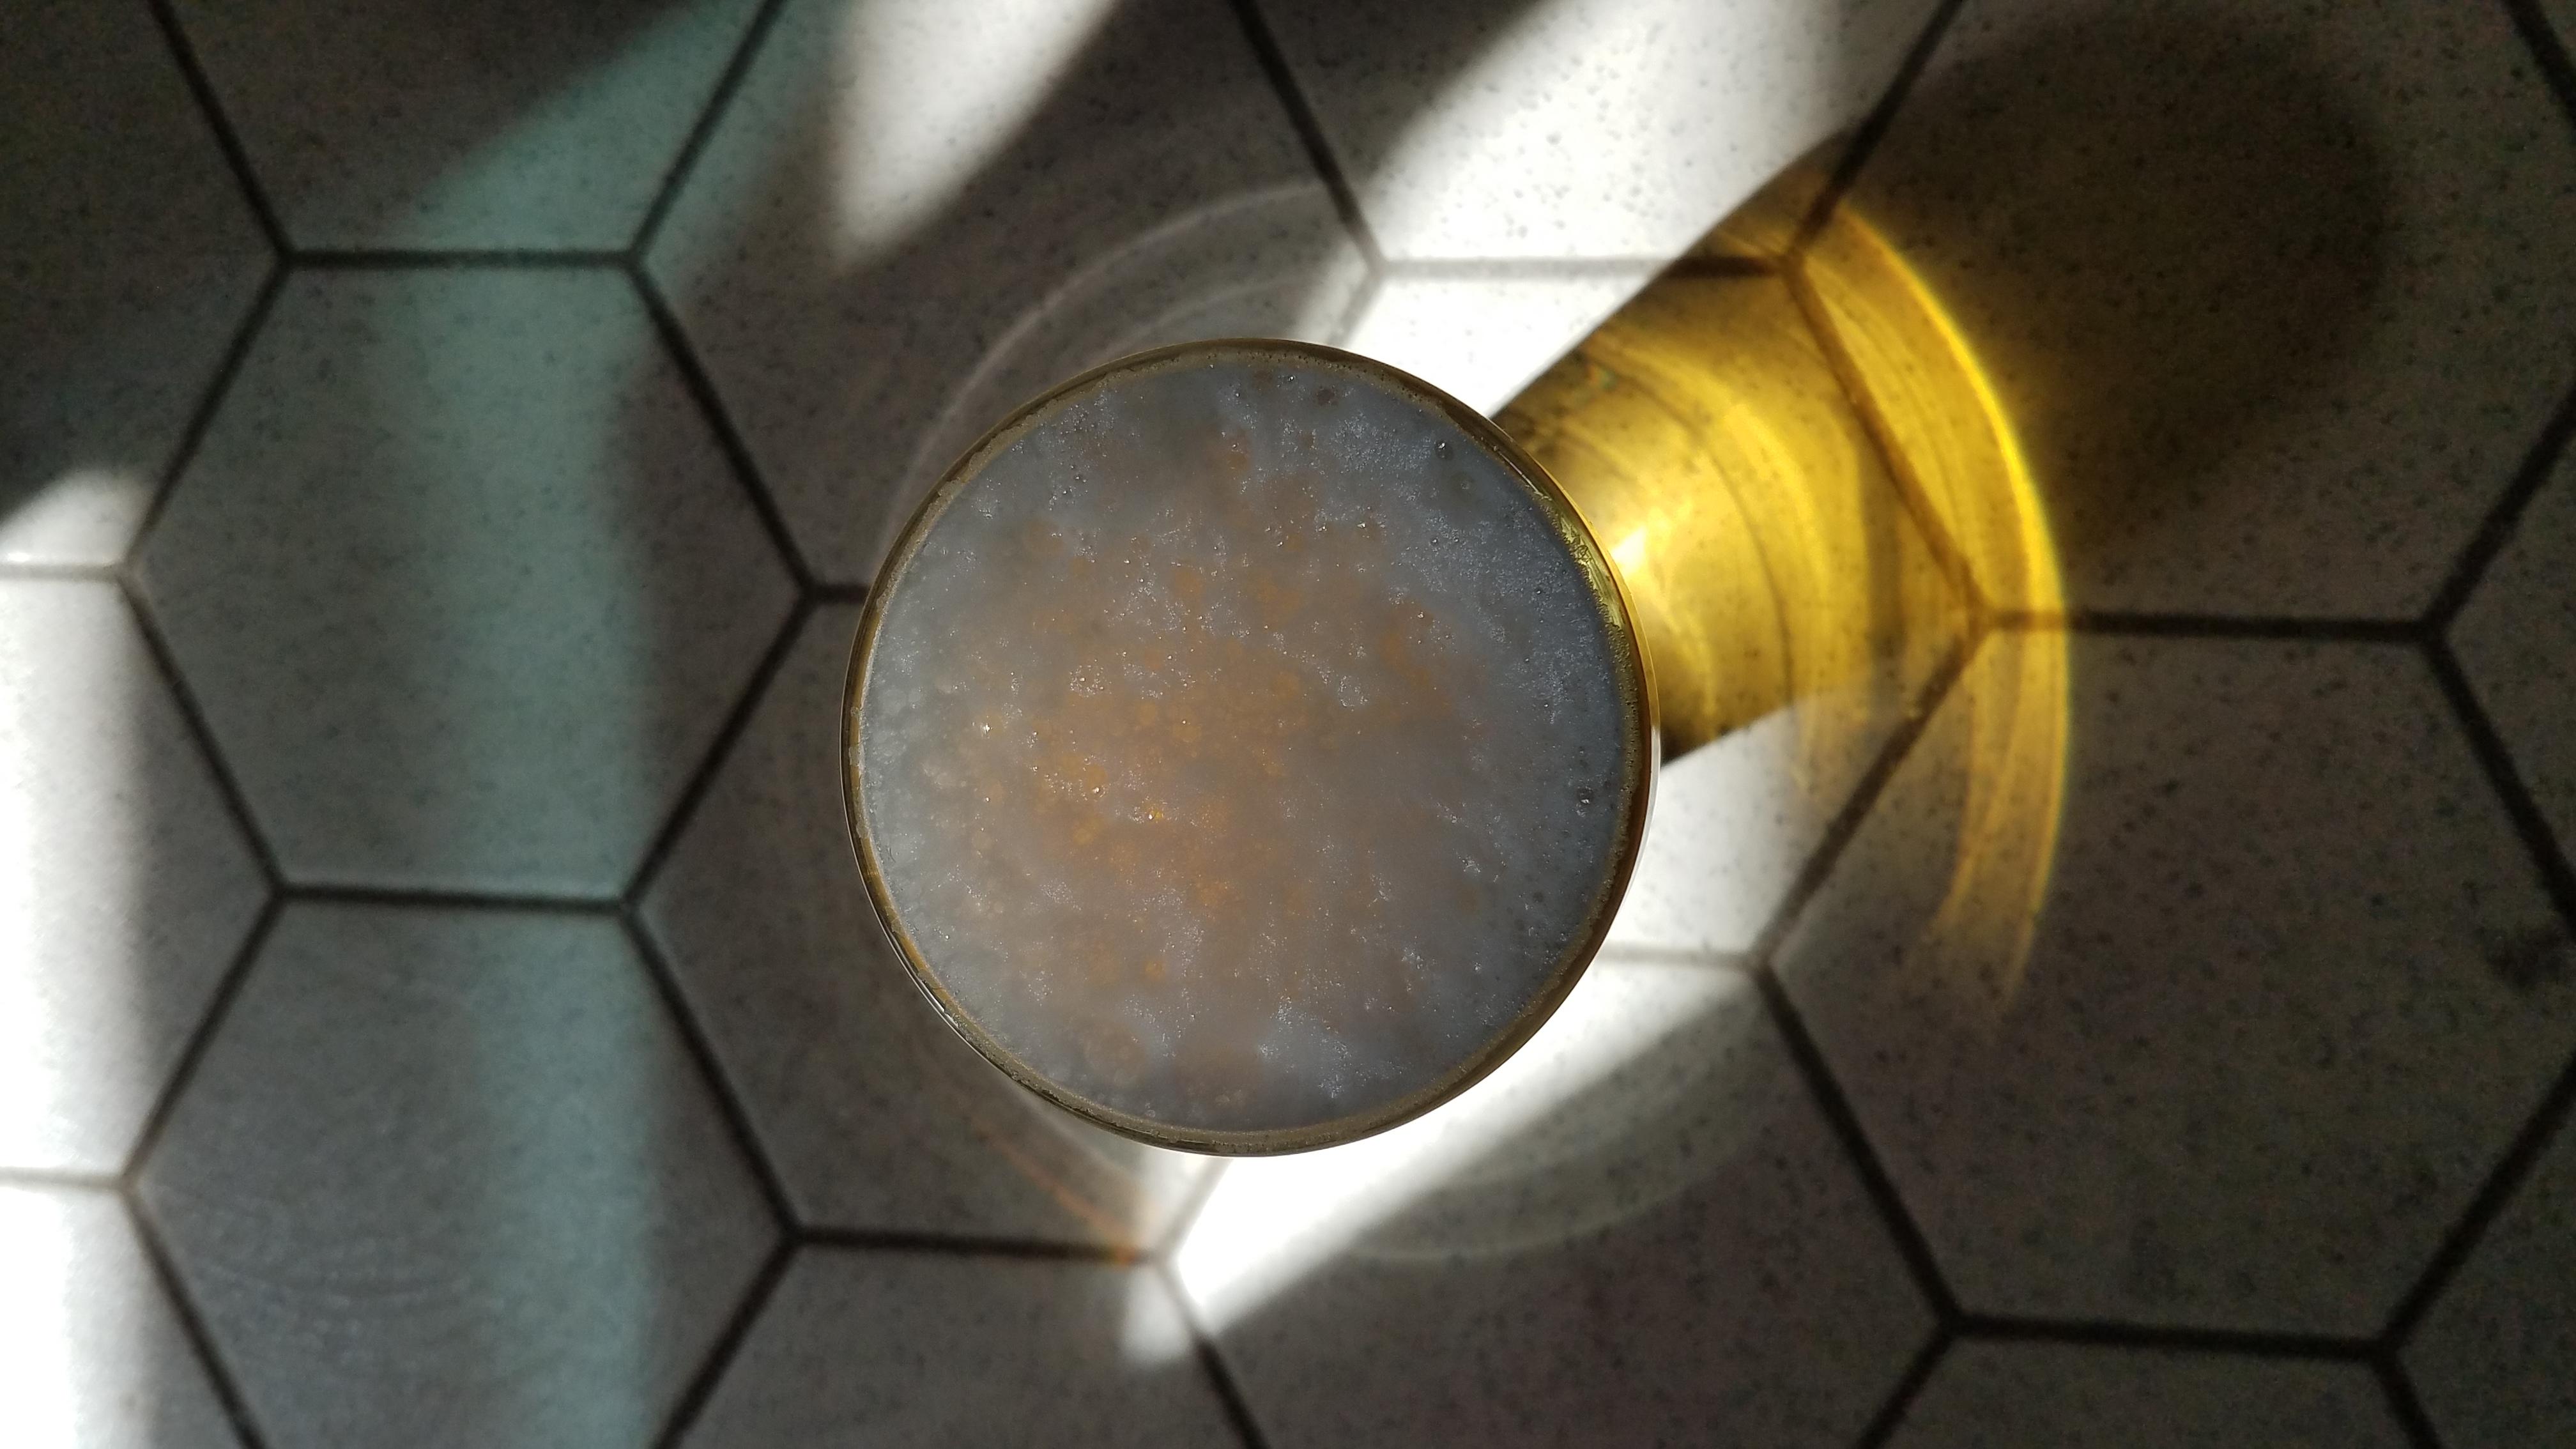 image of Reis Pils courtesy of Von Ebert Brewing